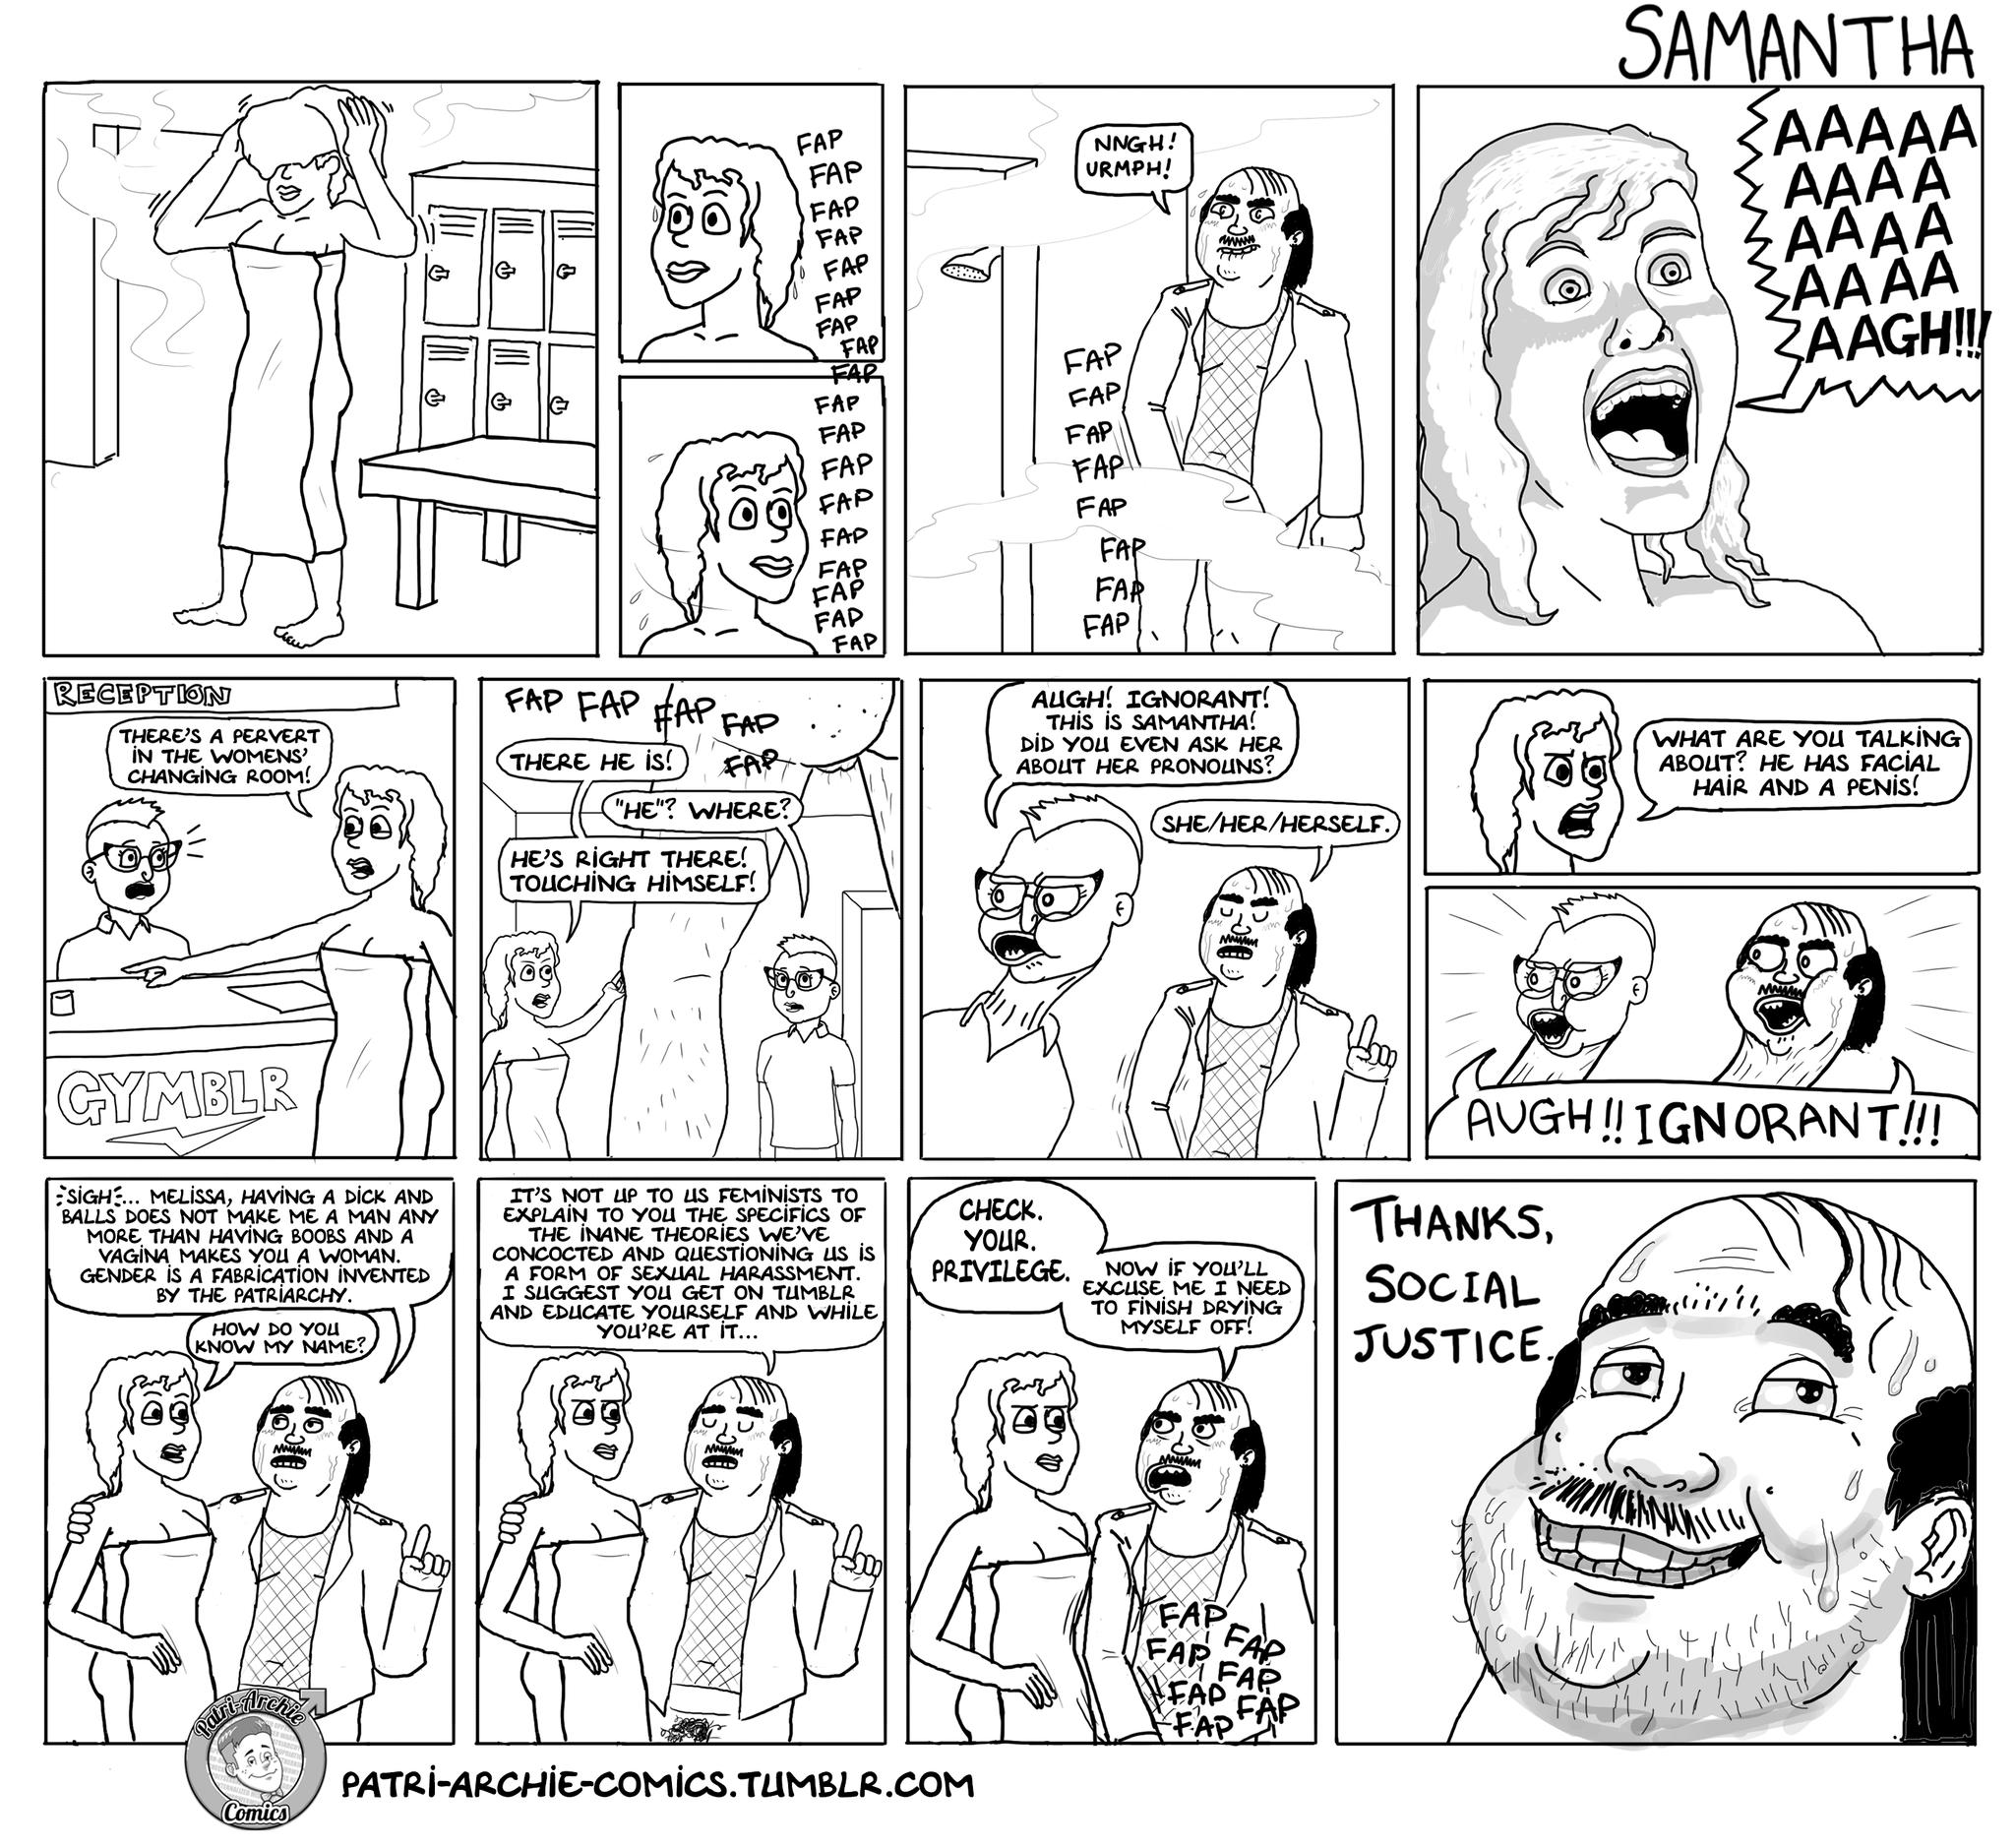 "Image Fap Comics Beautiful patri-archie comics on twitter: ""http://t.co/1bi7pp24u0 #sjwlogic"